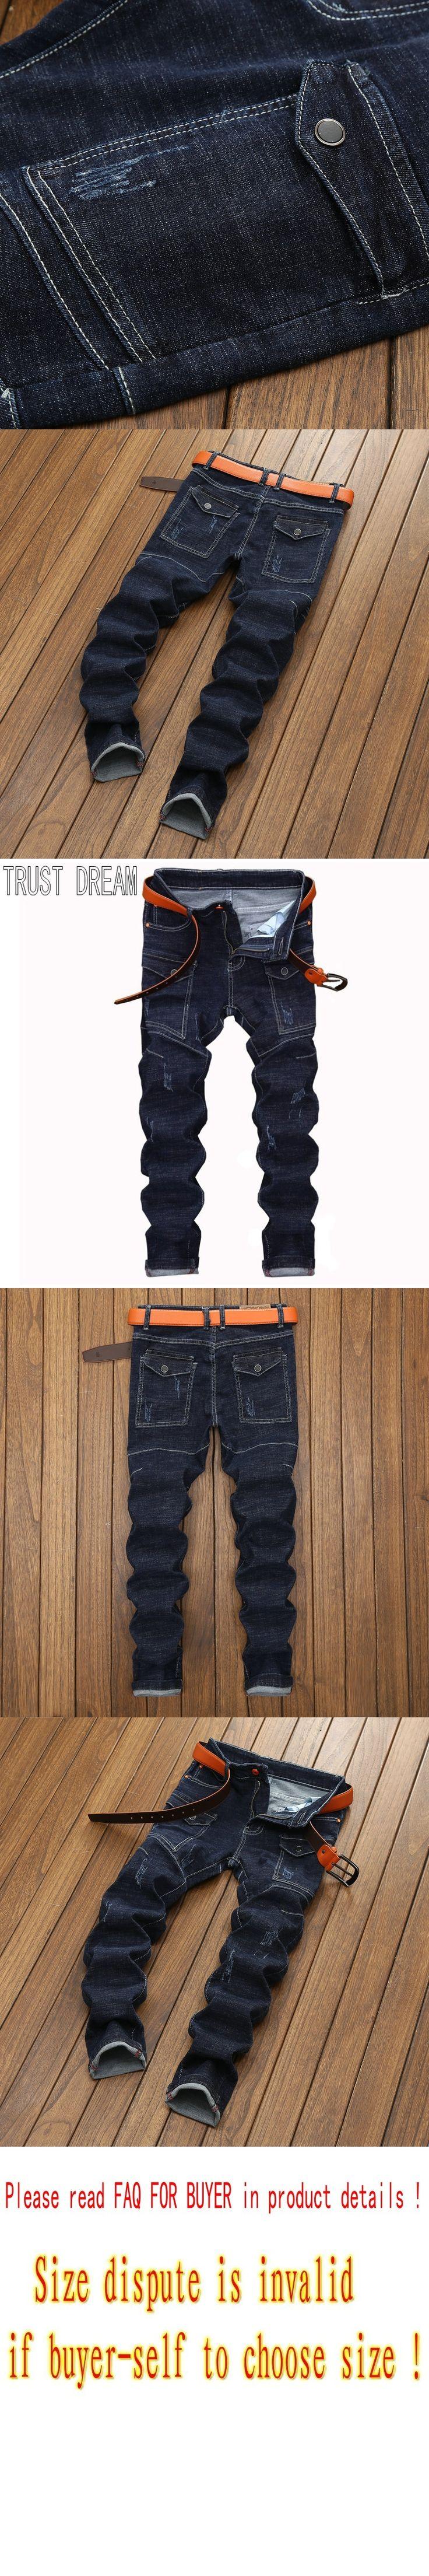 TRUST DREAM Europeans Designed Men More Pocekets Slim Dark Blue Jean Casual Man Fashion Street Personal Cargo Jeans